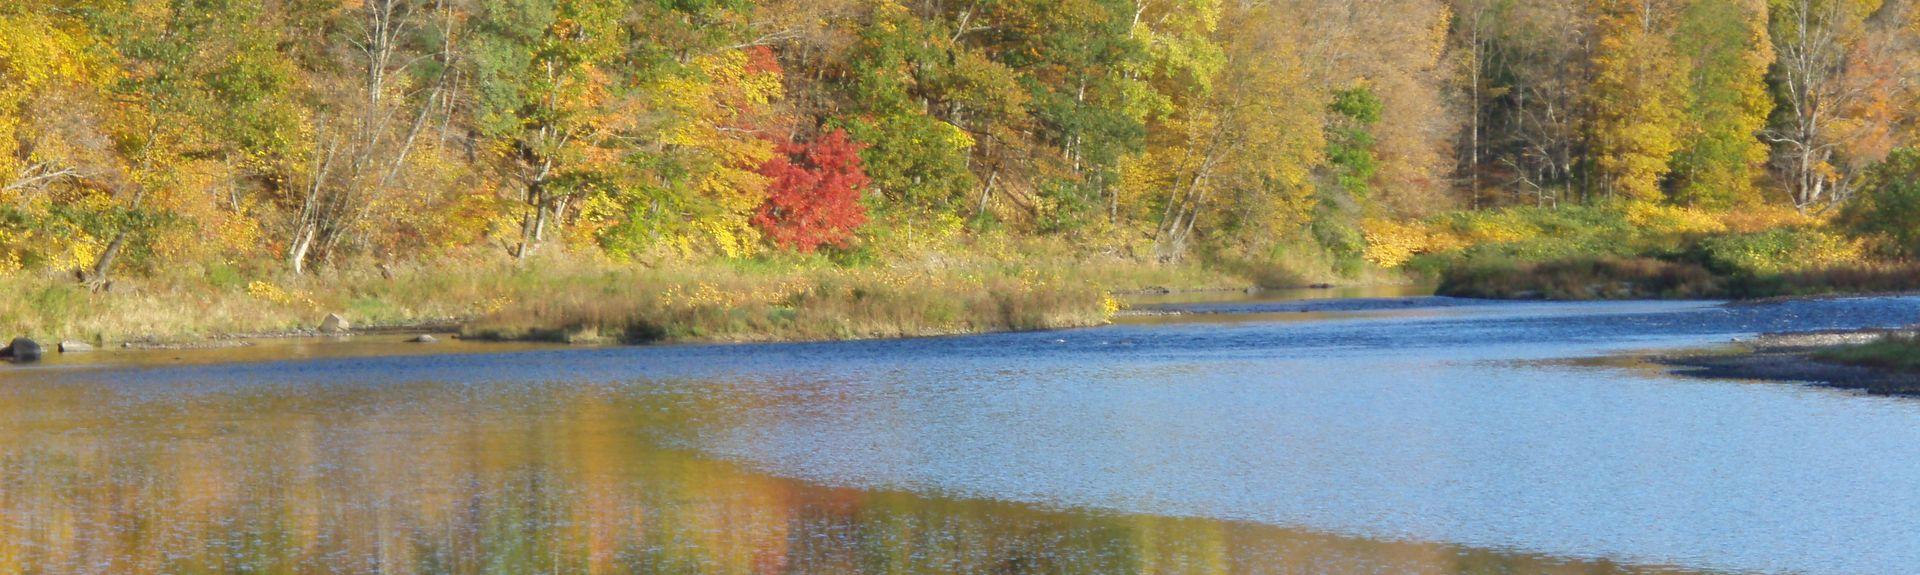 Preston Township, Pennsylvania, United States of America